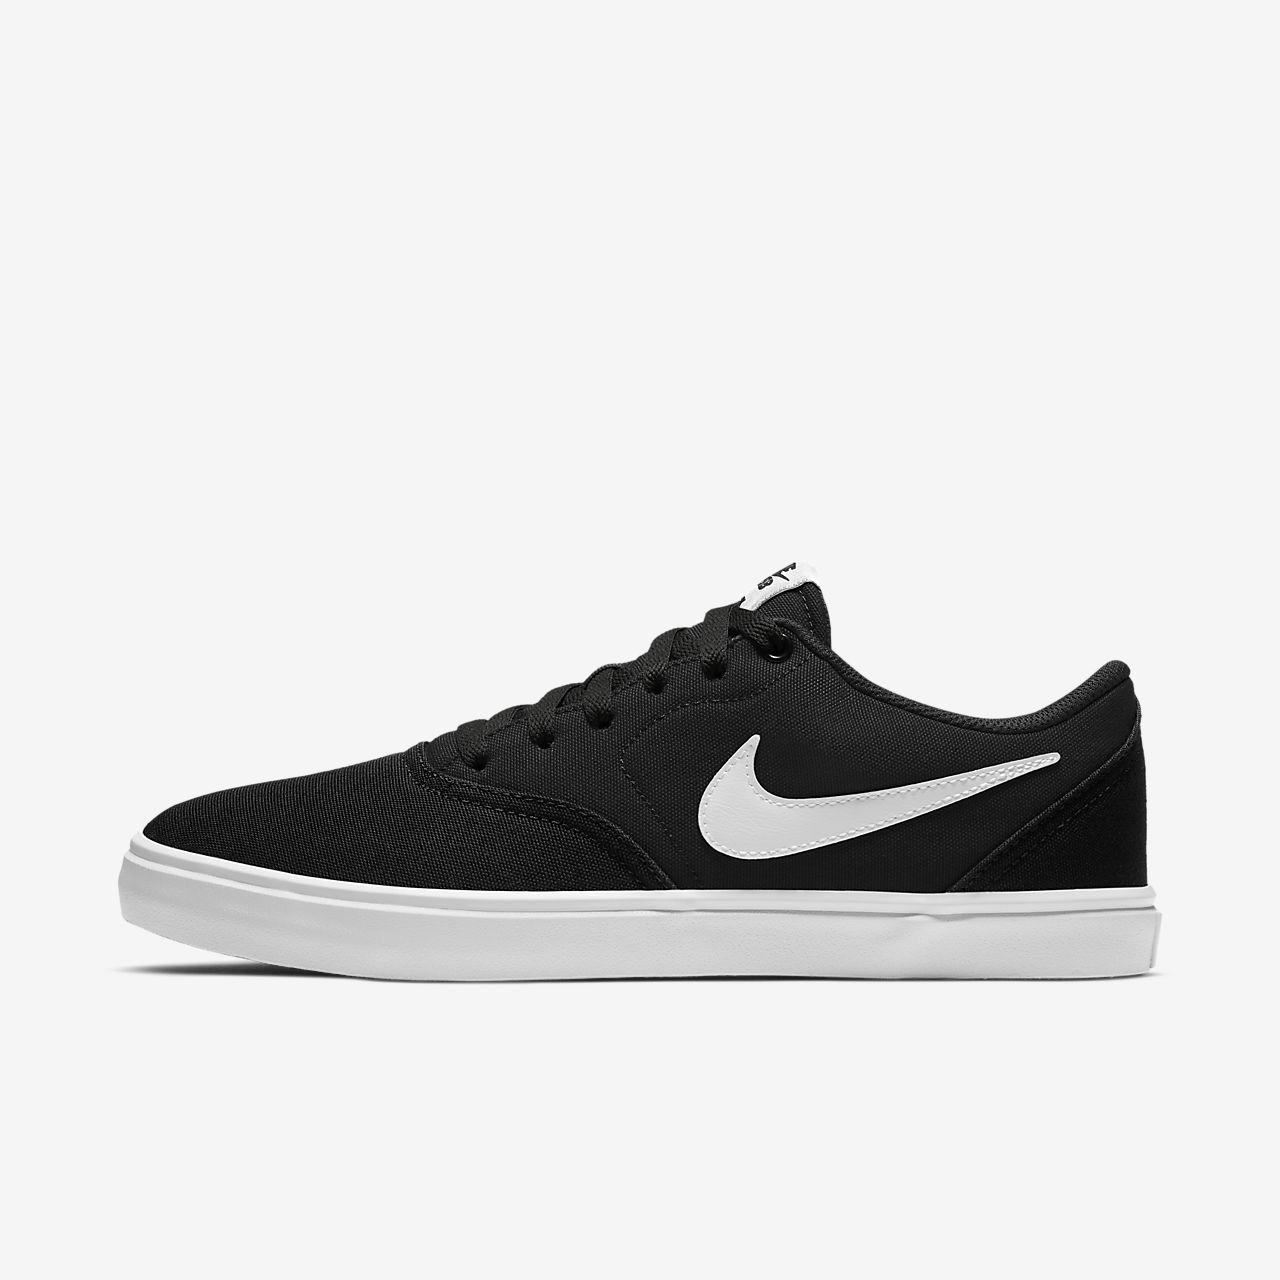 Nike SB Check Solar 843896-004 Men's Skateboarding Shoes Size 7.5